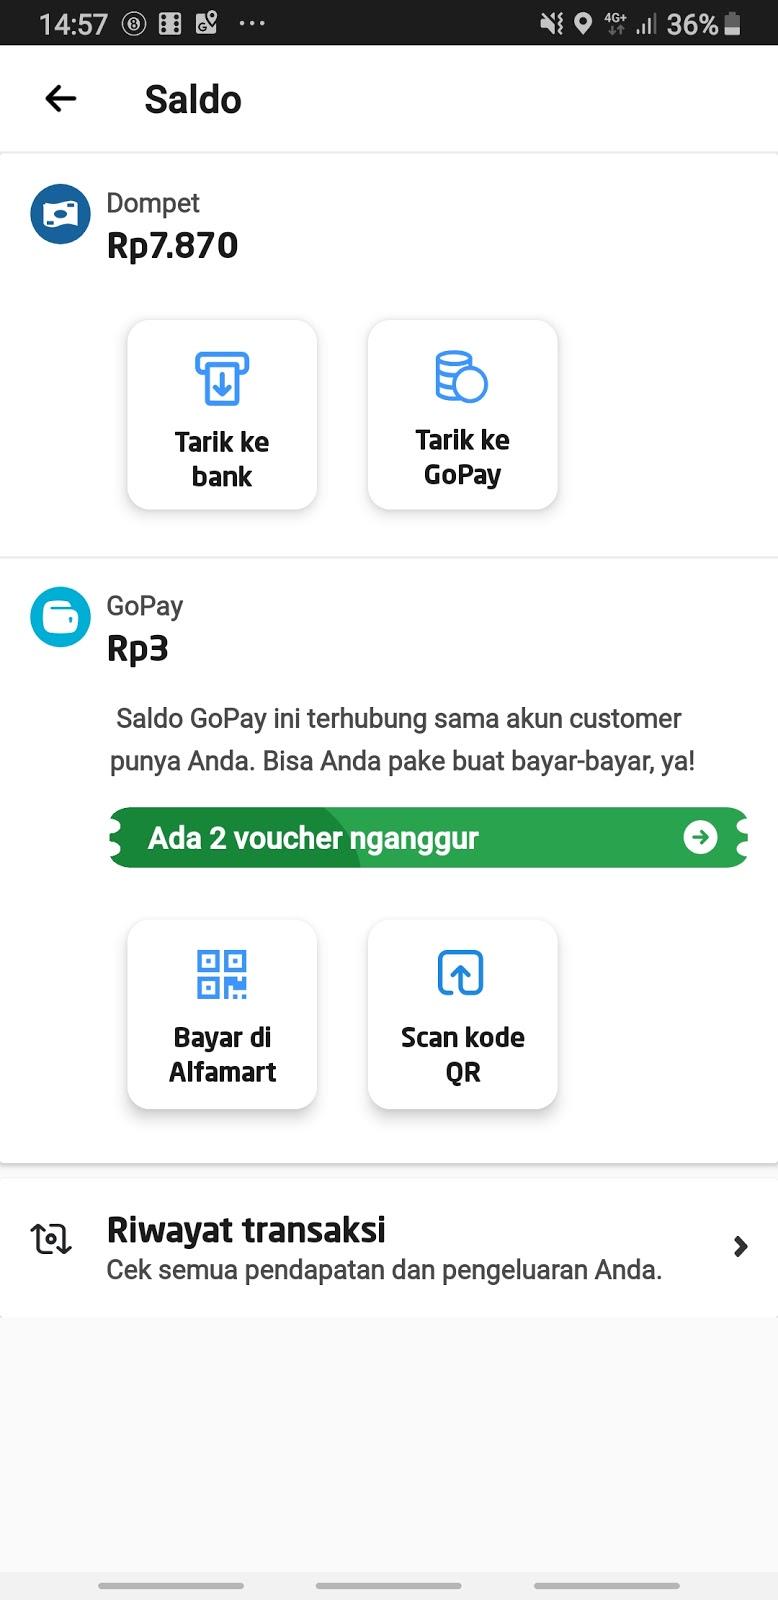 Gojek Driver V 4 10 1 Fitur Transfer Gopay Driver Ke Gopay Customer Pribadi